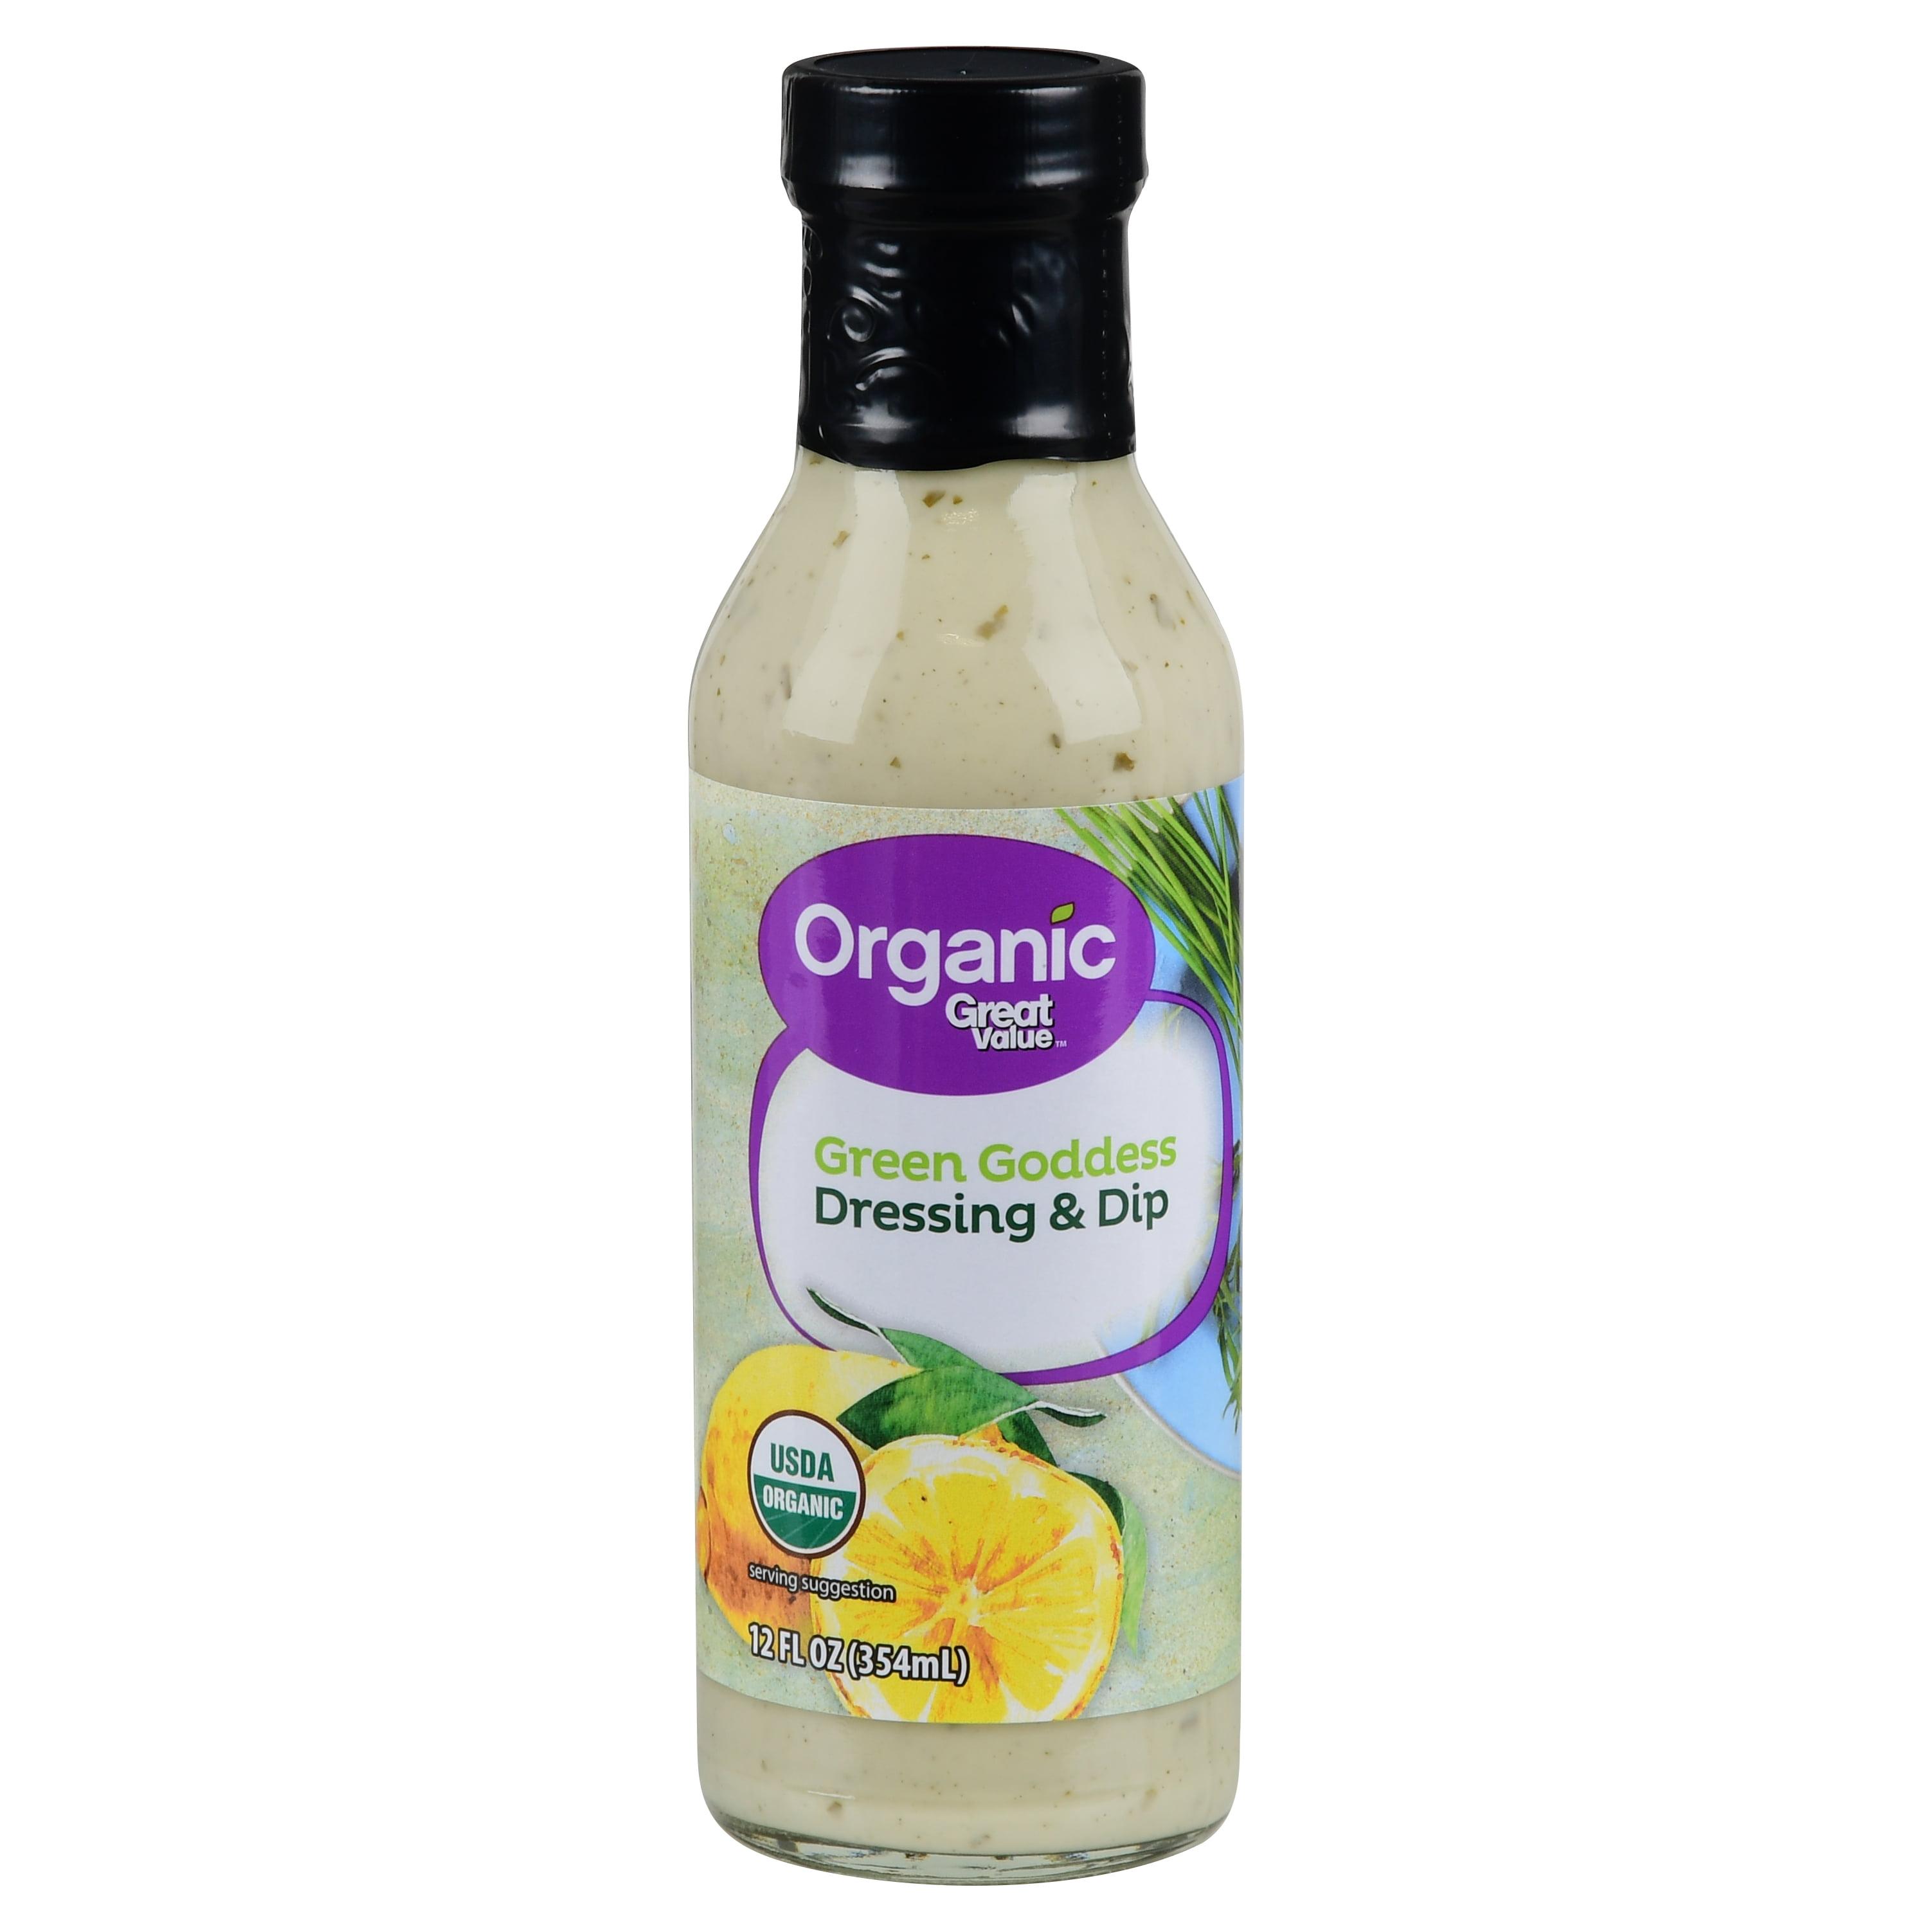 (2 Pack) Great Value Organic Green Goddess Dressing & Dip, 12 fl oz